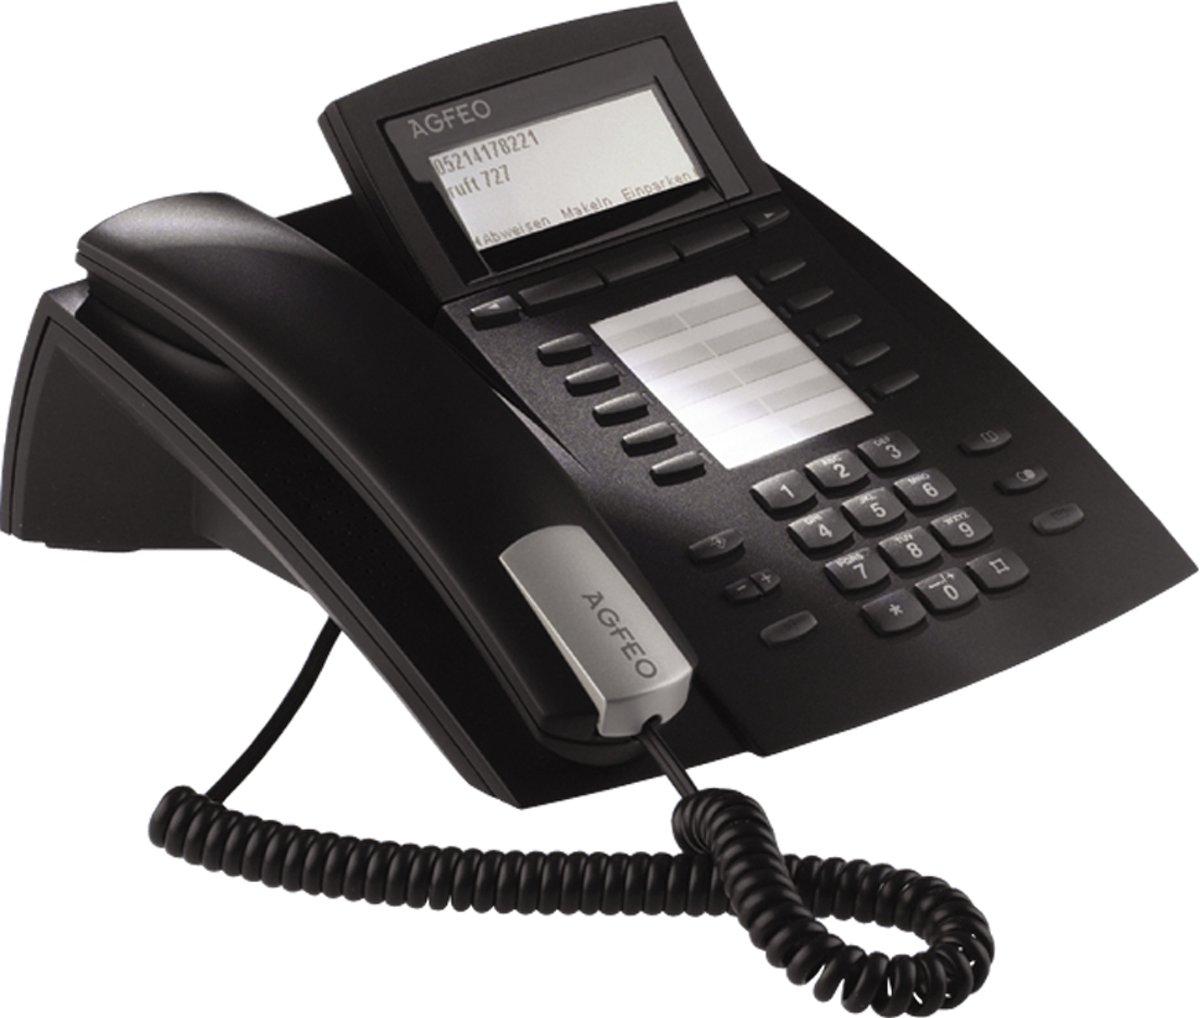 AGFEO ST42 IP - VoIP telefoon - Zwart